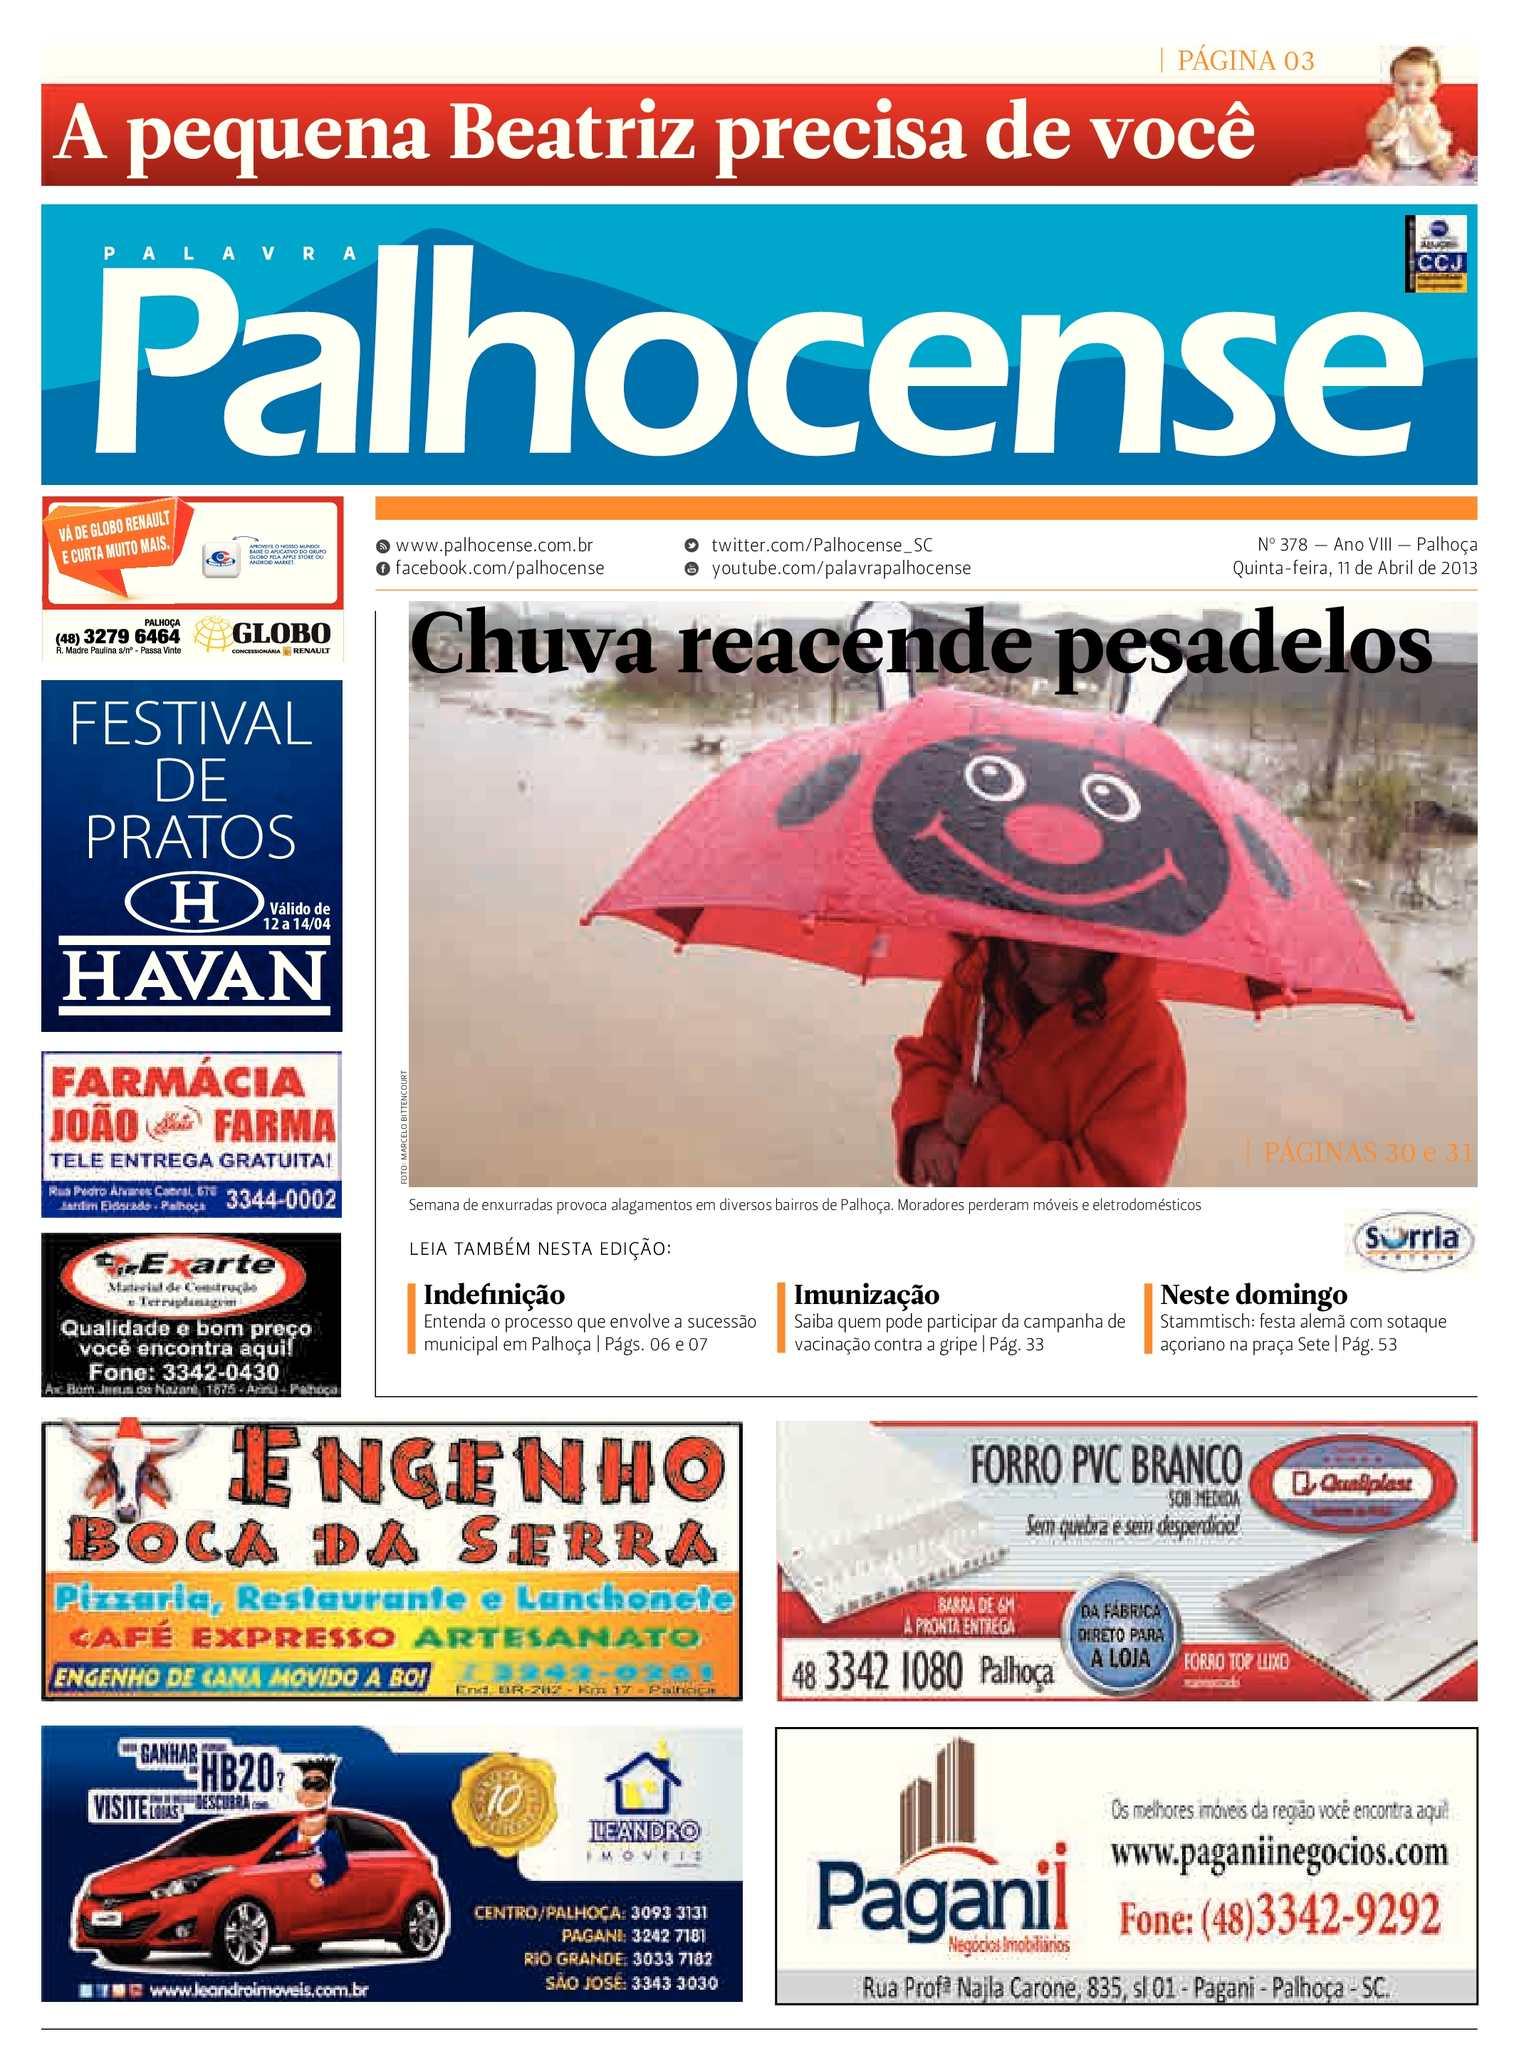 Calaméo - Jornal Palavra Palhocense - Edição 378 08401519a6b58